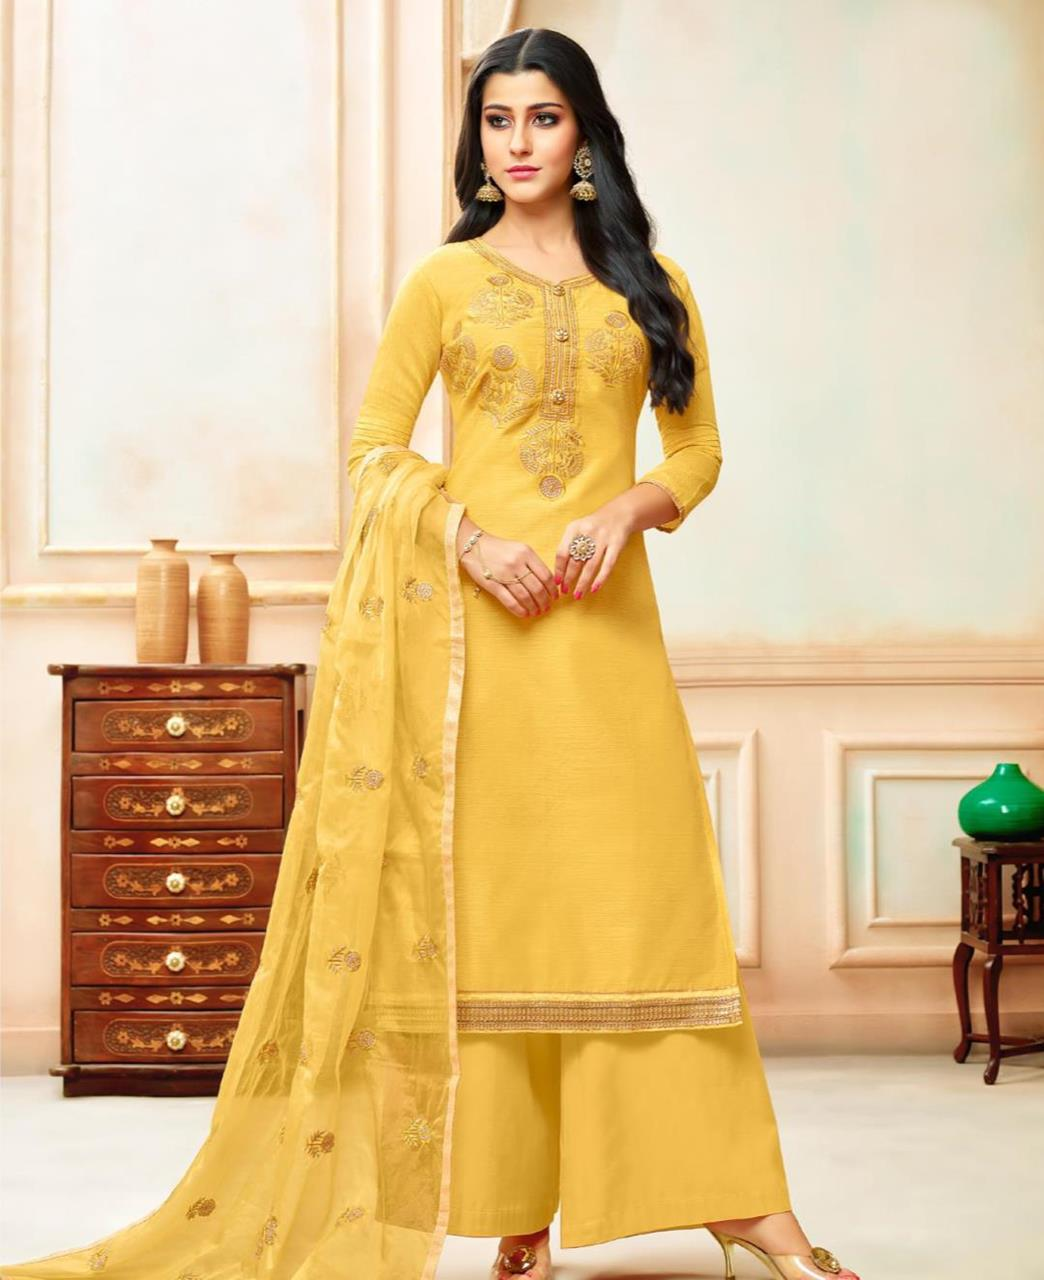 Embroidered Silk Yellow Palazzo Suit Salwar Kameez